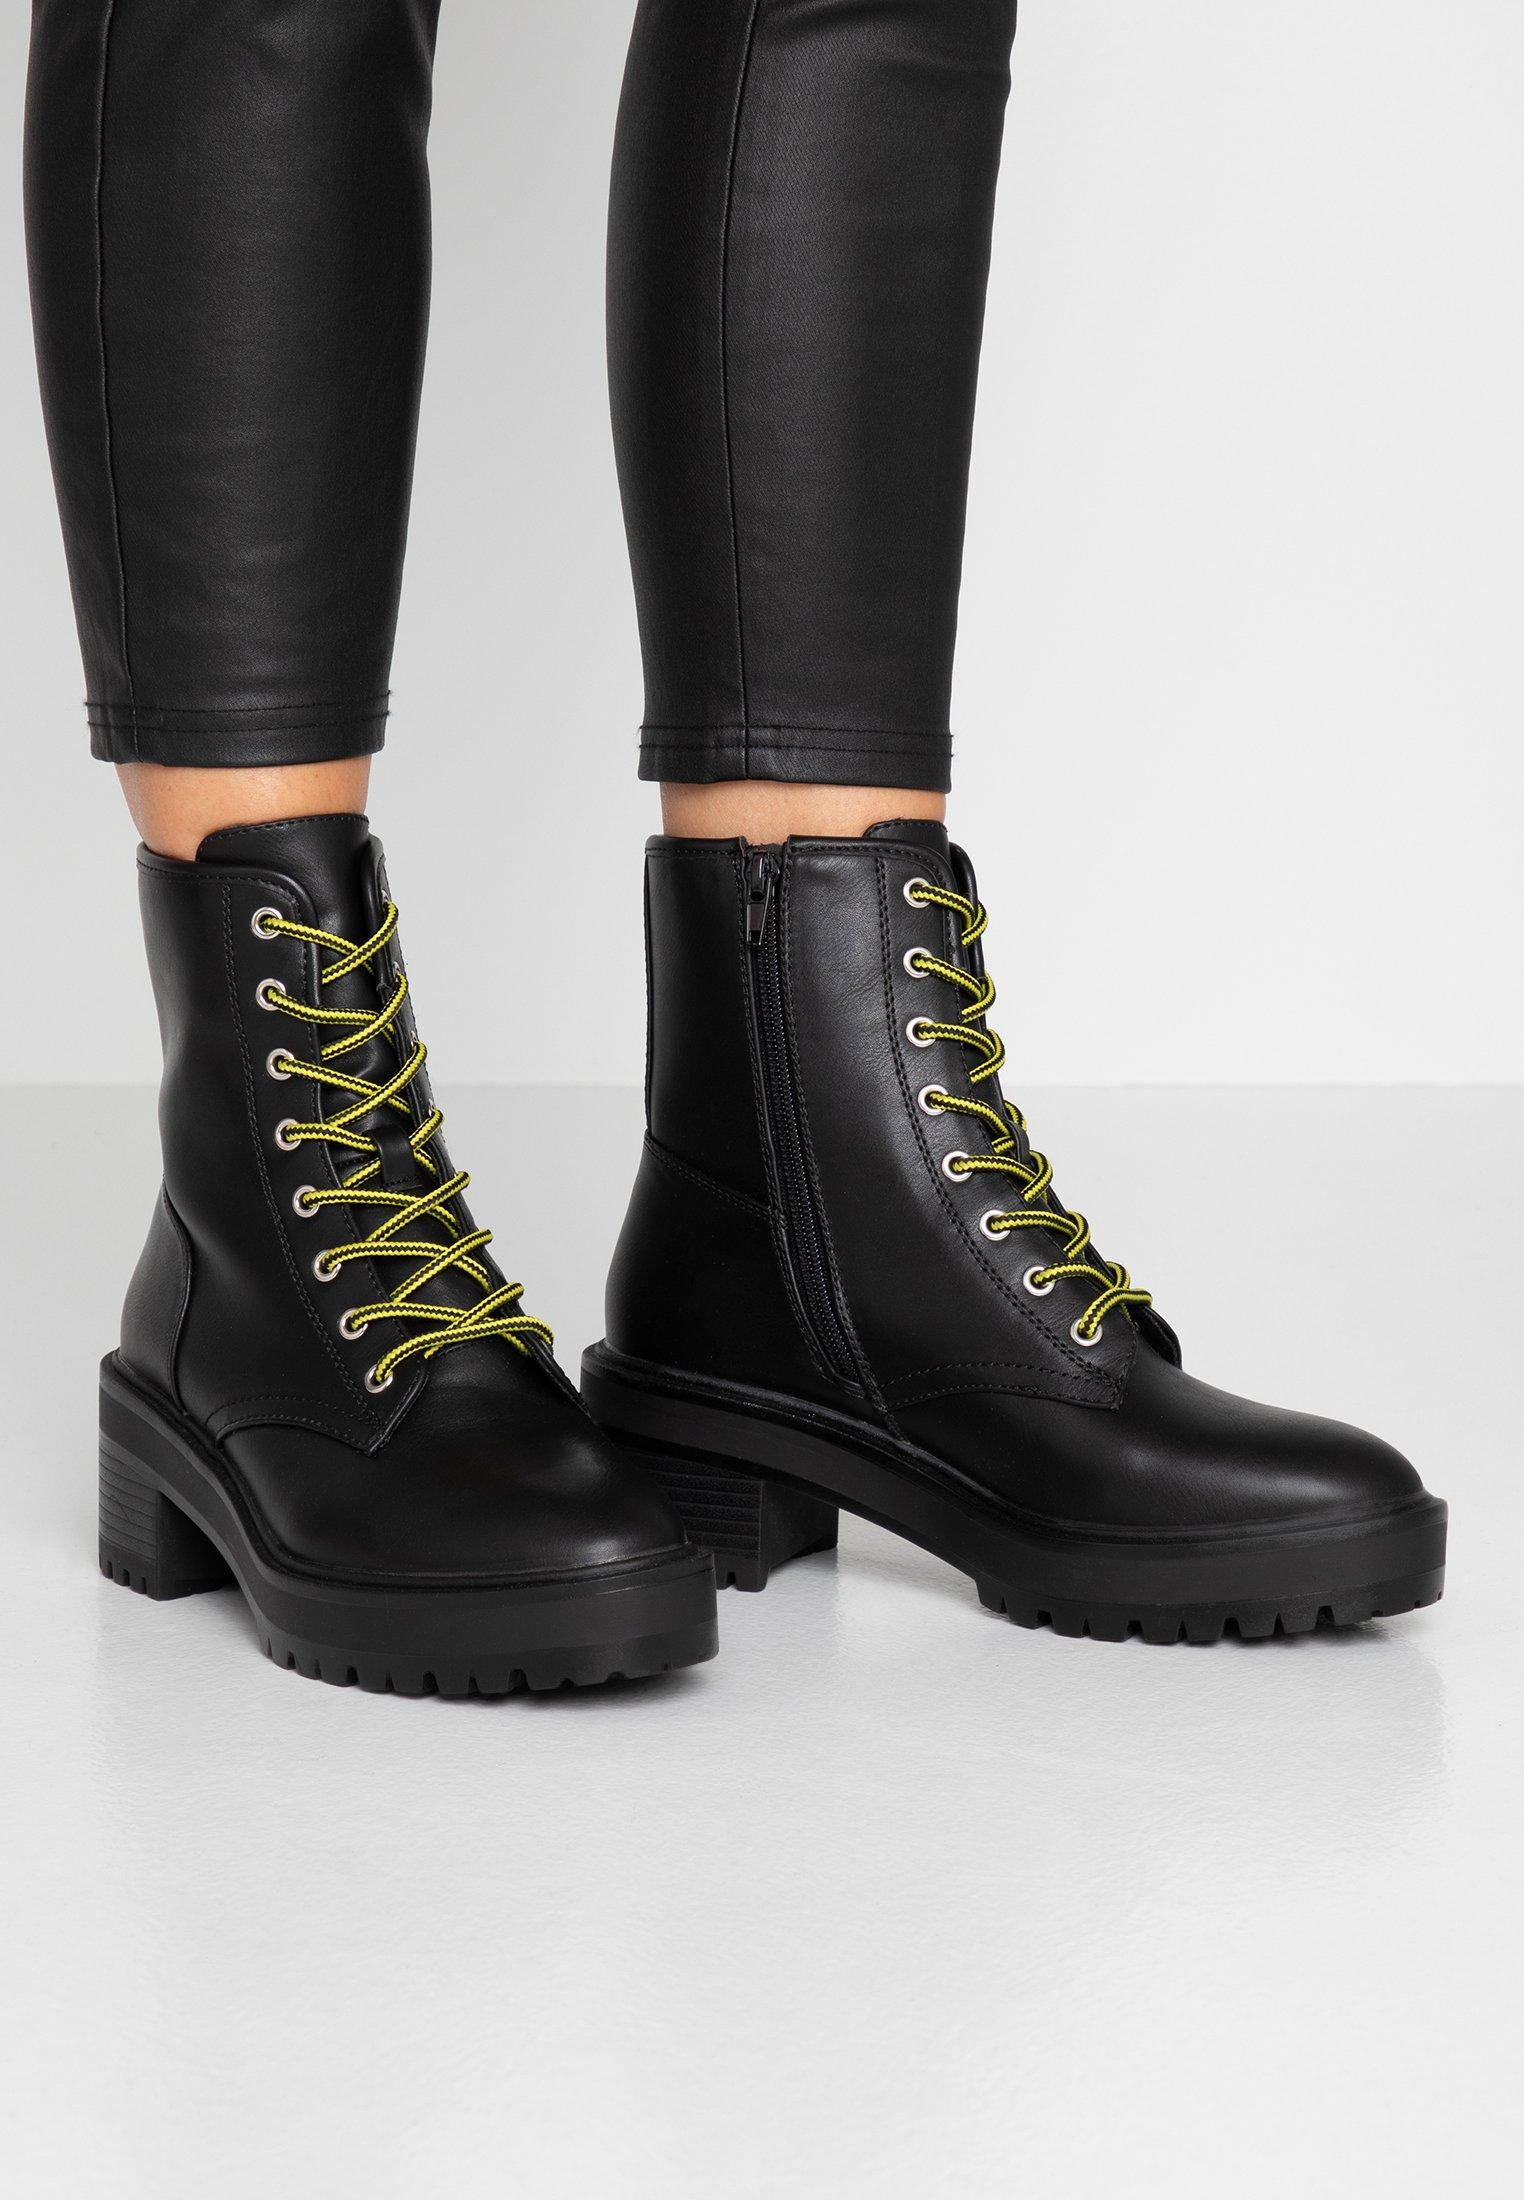 Even&Odd Plateaustiefelette - black  Stiefeletten für Damen QSCTJ